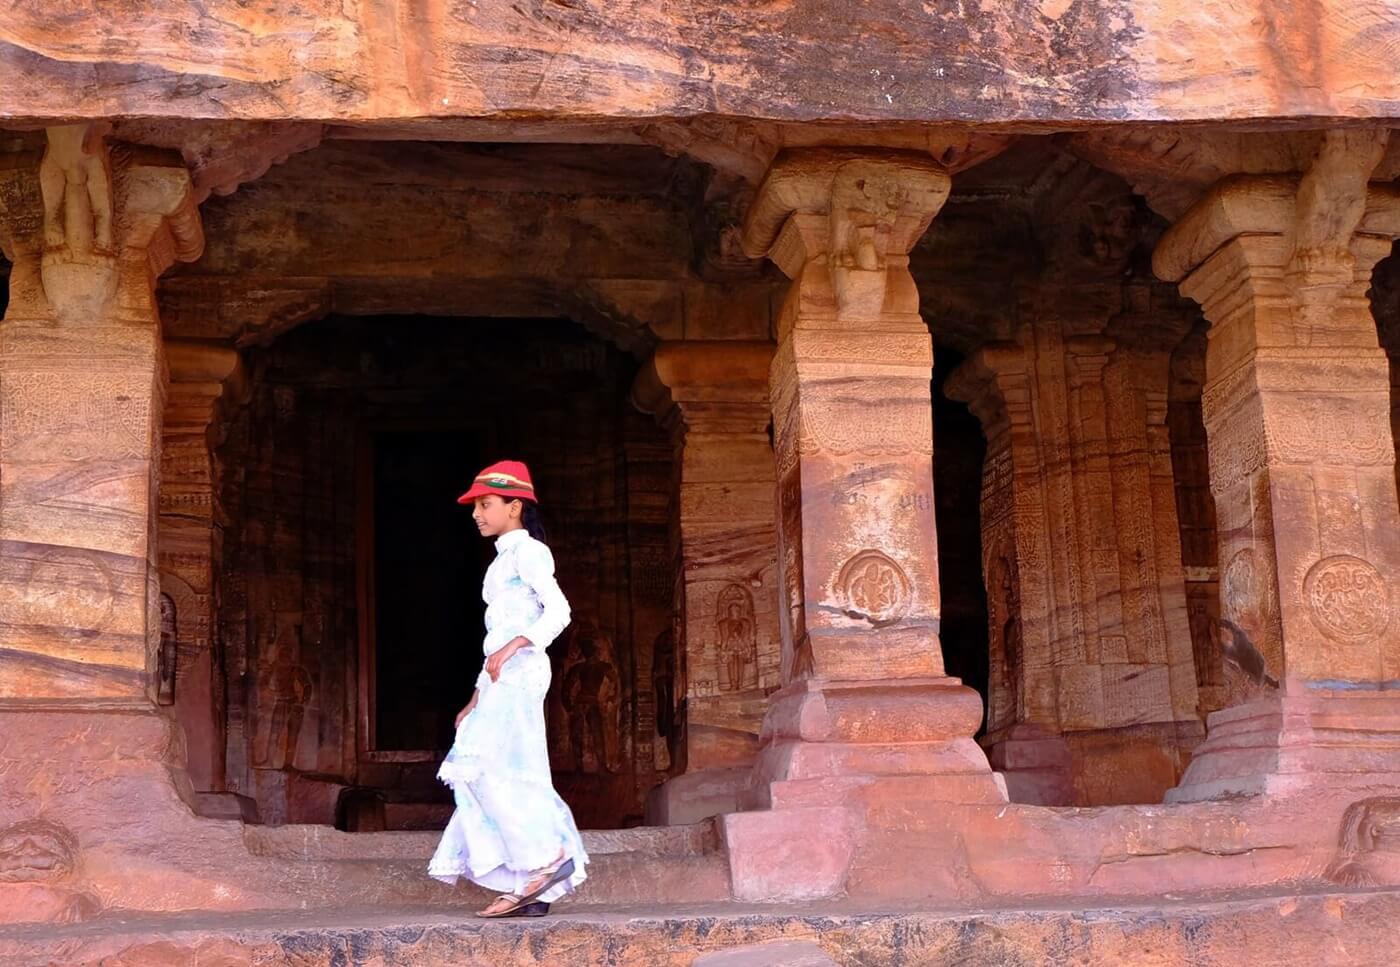 Visiting the Badami Cave Temples in Karnataka, India